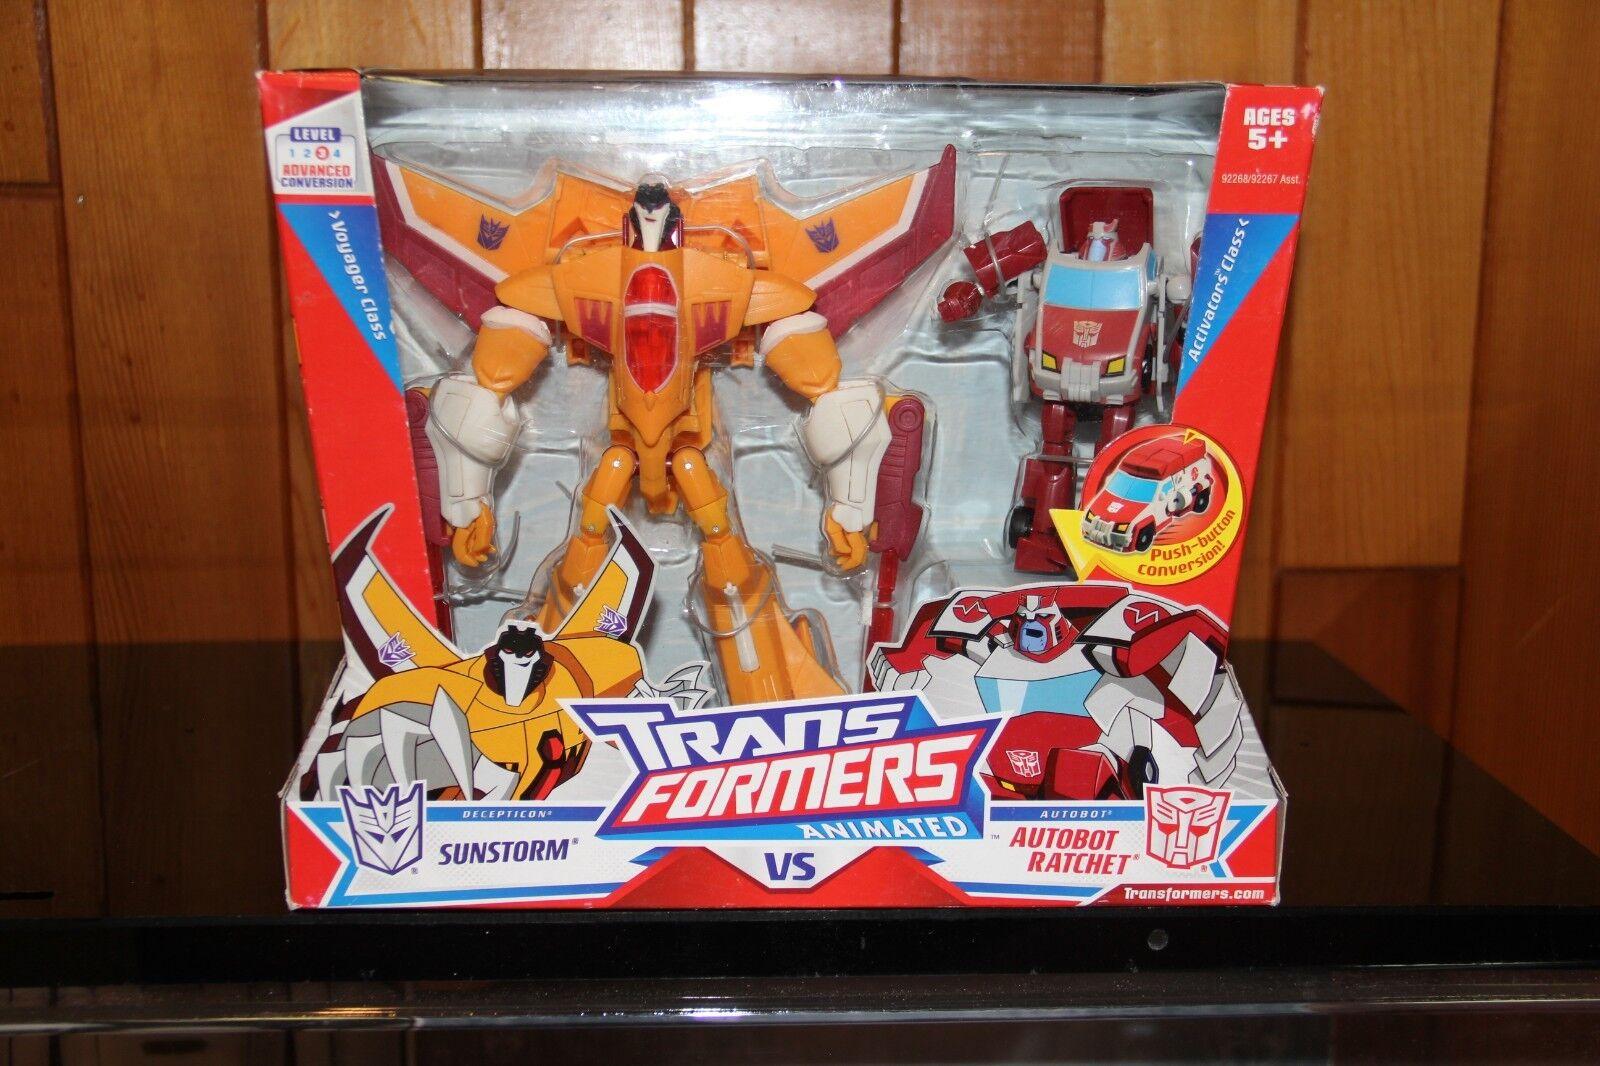 Hasbro Transformers Animated Sunstorm VS Autobot Rachet Target Exclusive